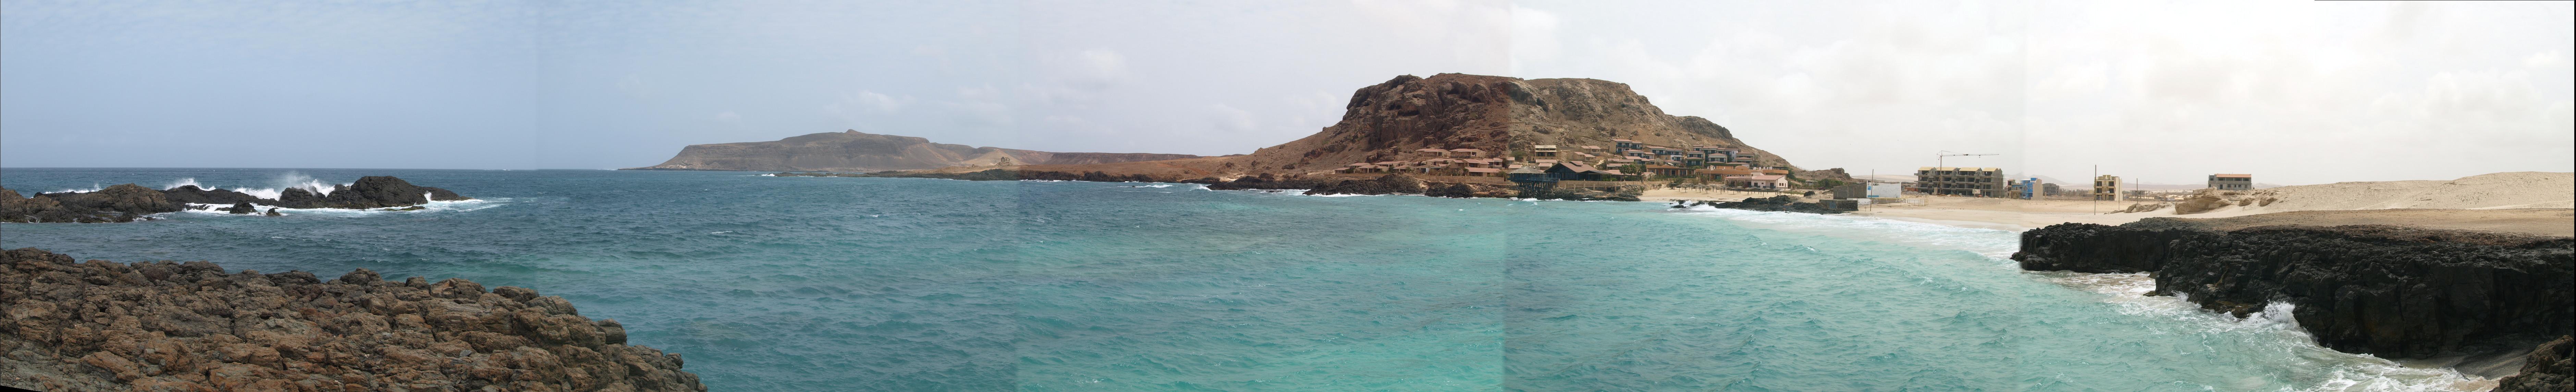 P3282319 Pano Cabo Verde Boavista  Sal Rai